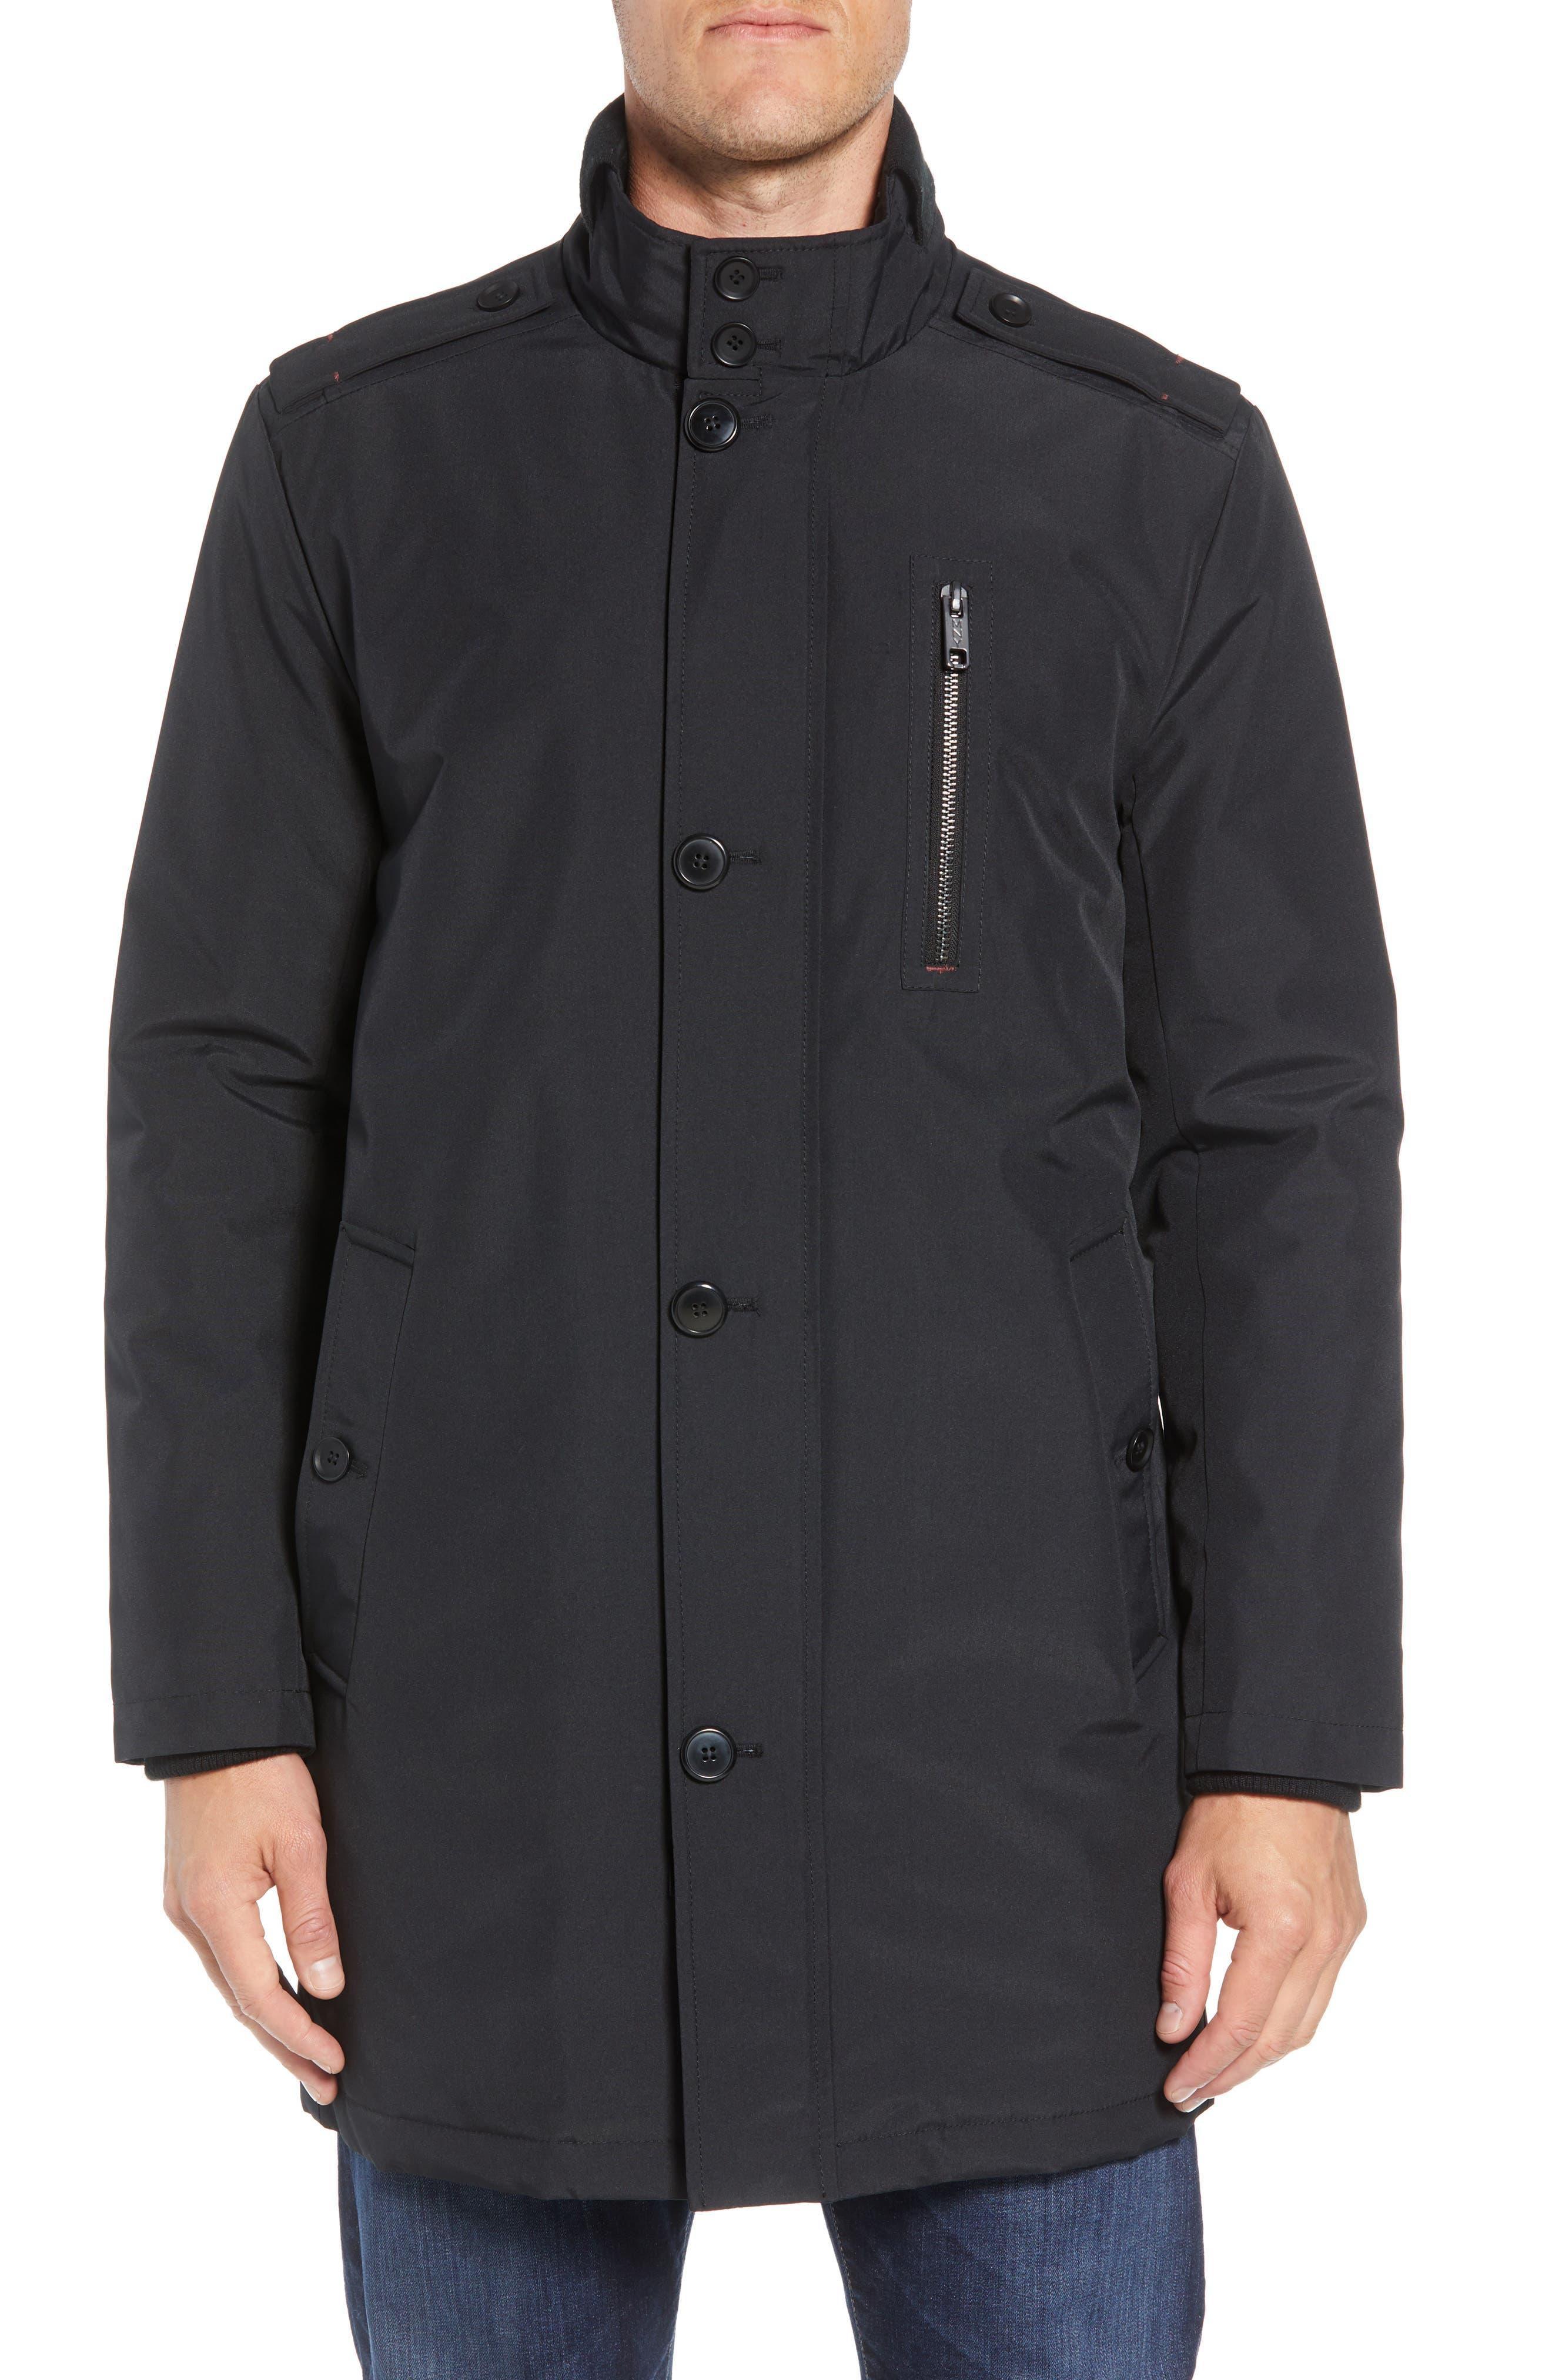 MARC NEW YORK, Cullen Oxford Car Coat, Alternate thumbnail 4, color, BLACK